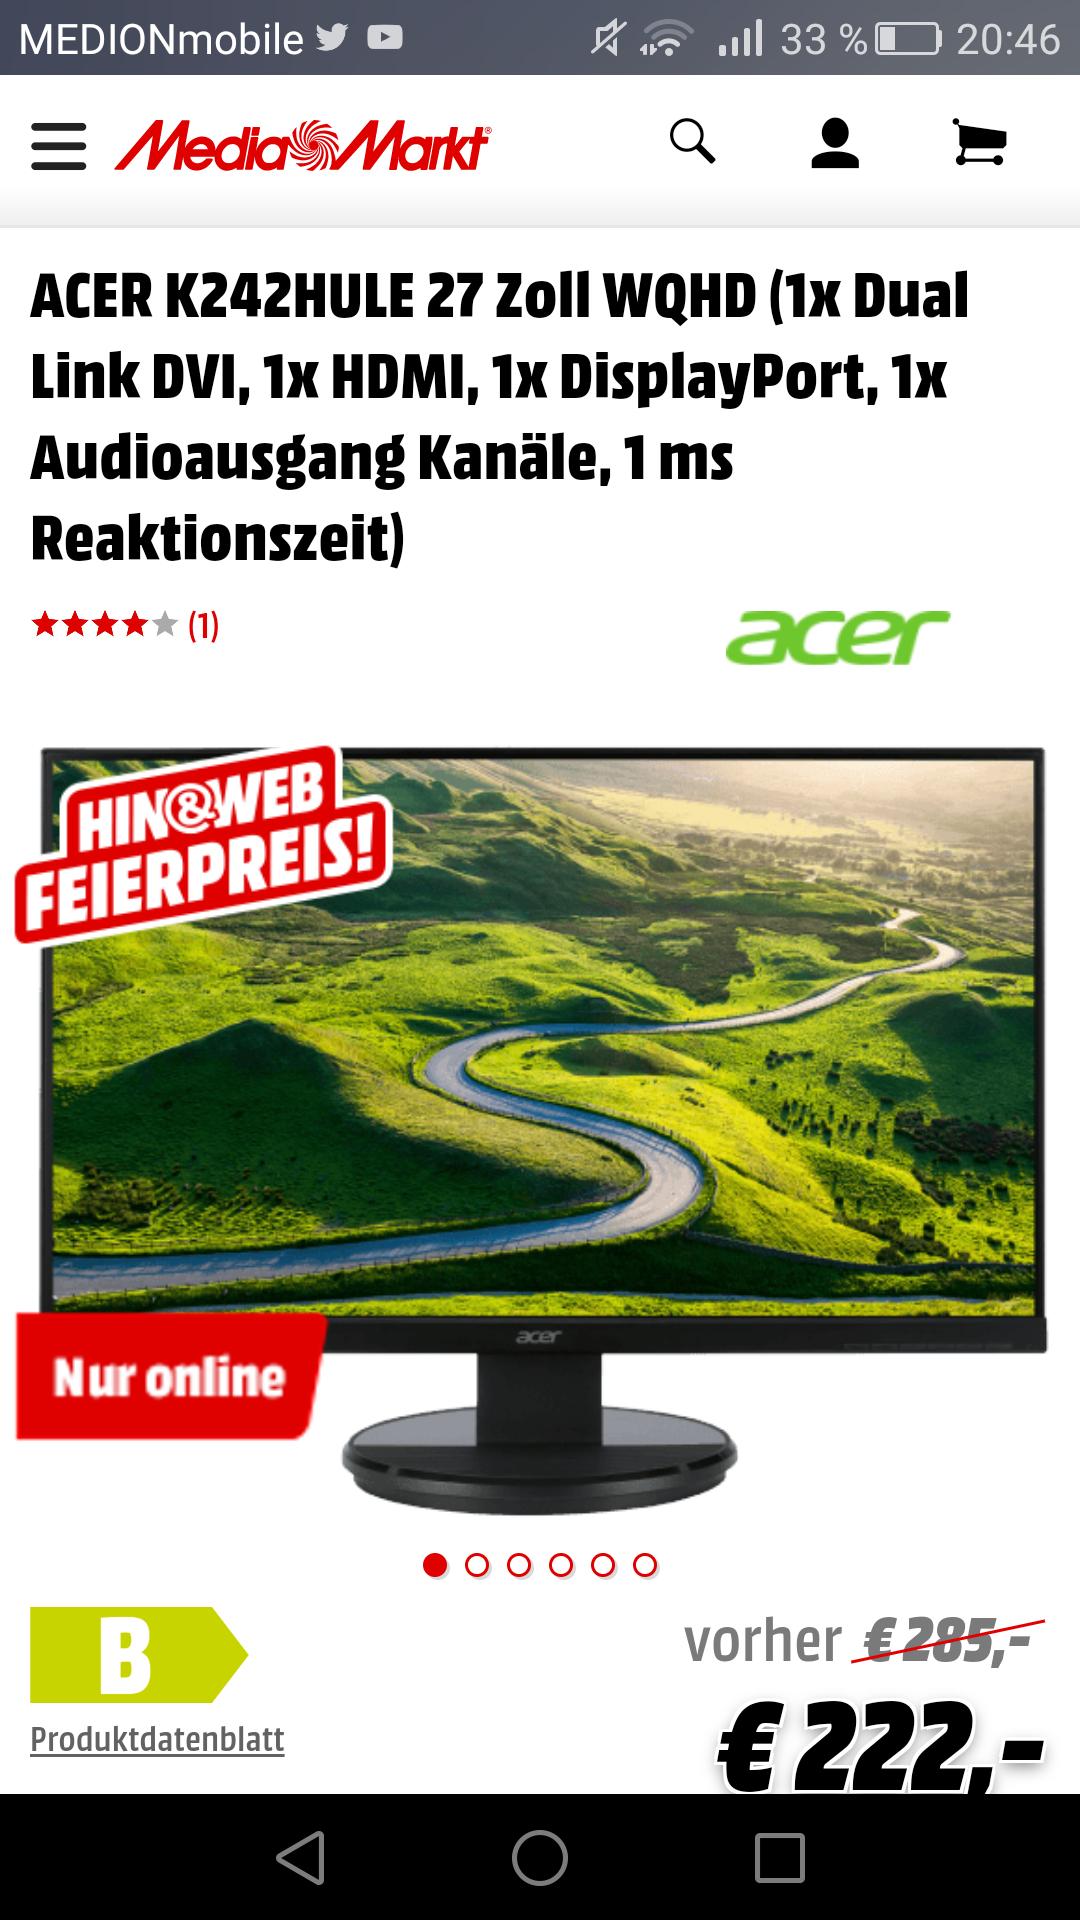 [Media Markt] 27 Zoll WQHD 1ms Reaktionszeit Acer Monitor